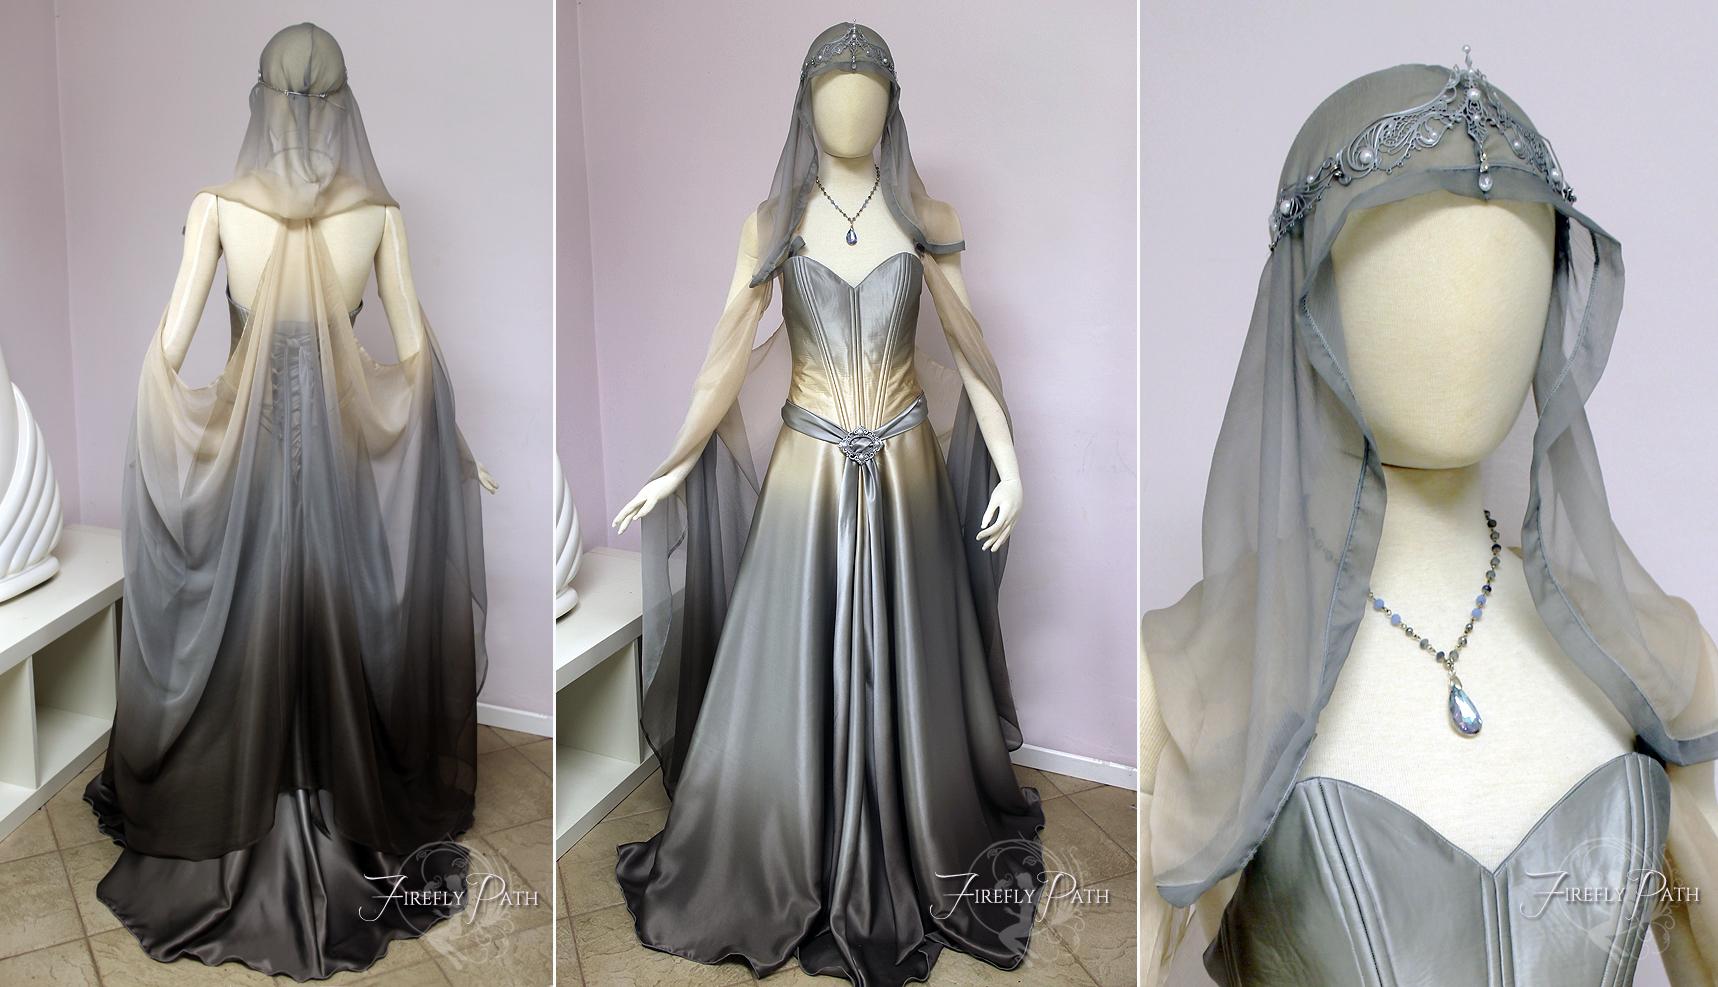 Wicca Wedding Rings 008 - Wicca Wedding Rings